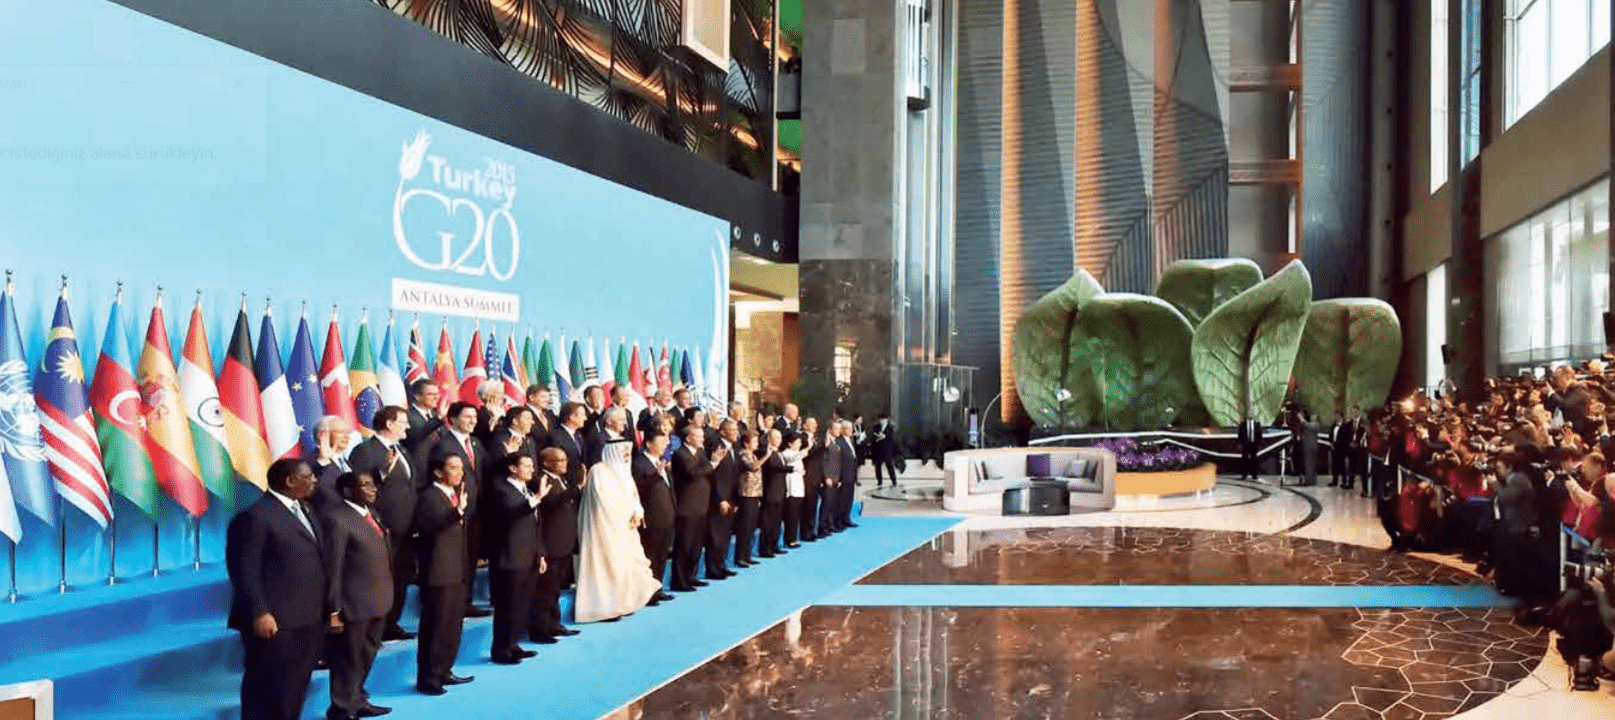 Regnum Karya Resort G20 mármol crema vainilla turco calixto